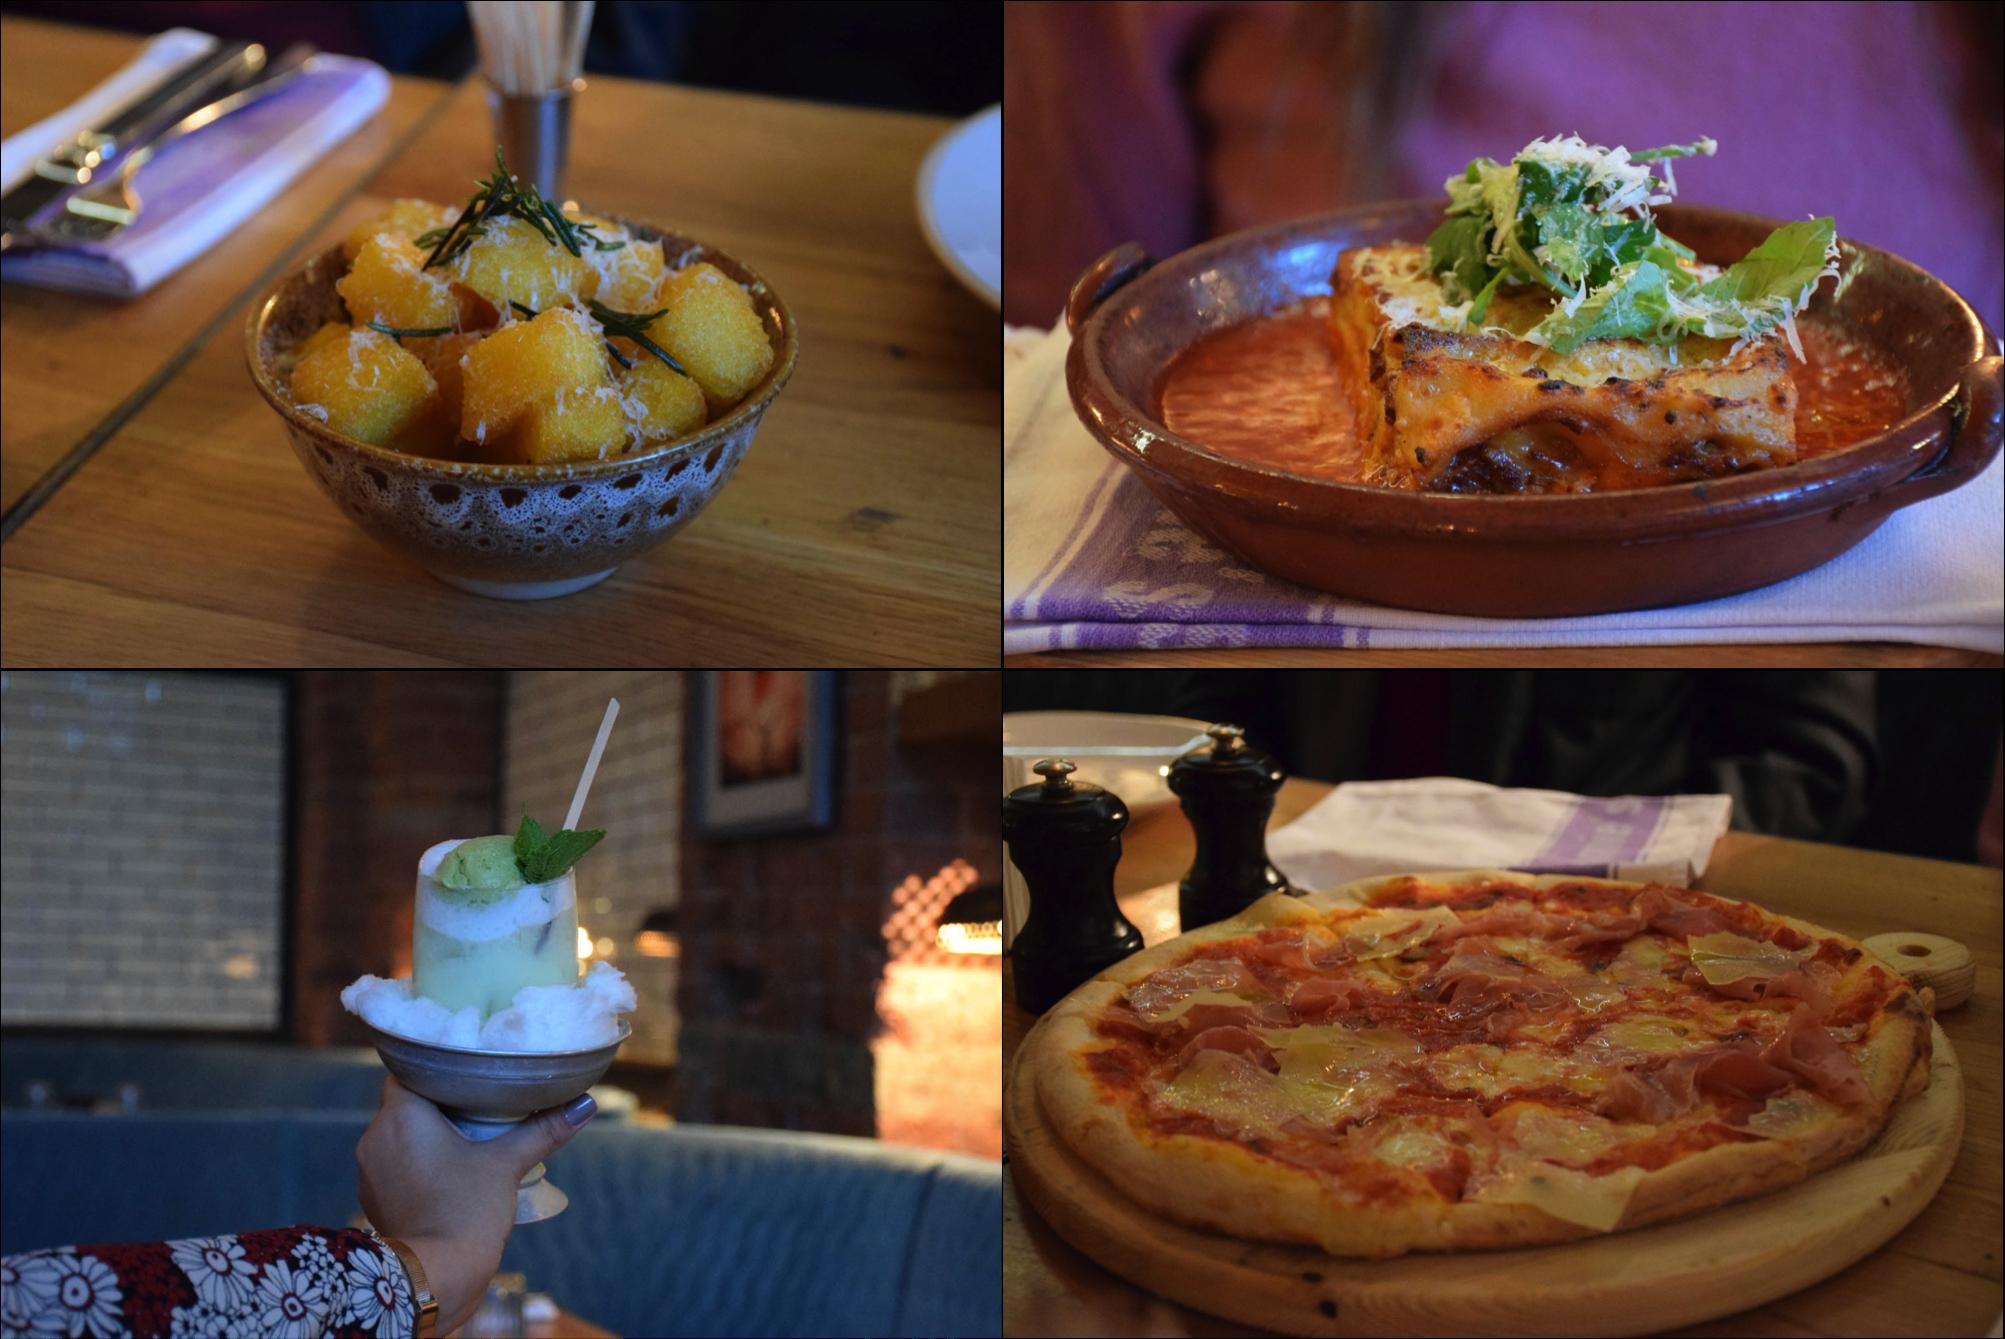 restaurante jamie italian sao petersburgo russia dicas onde comer